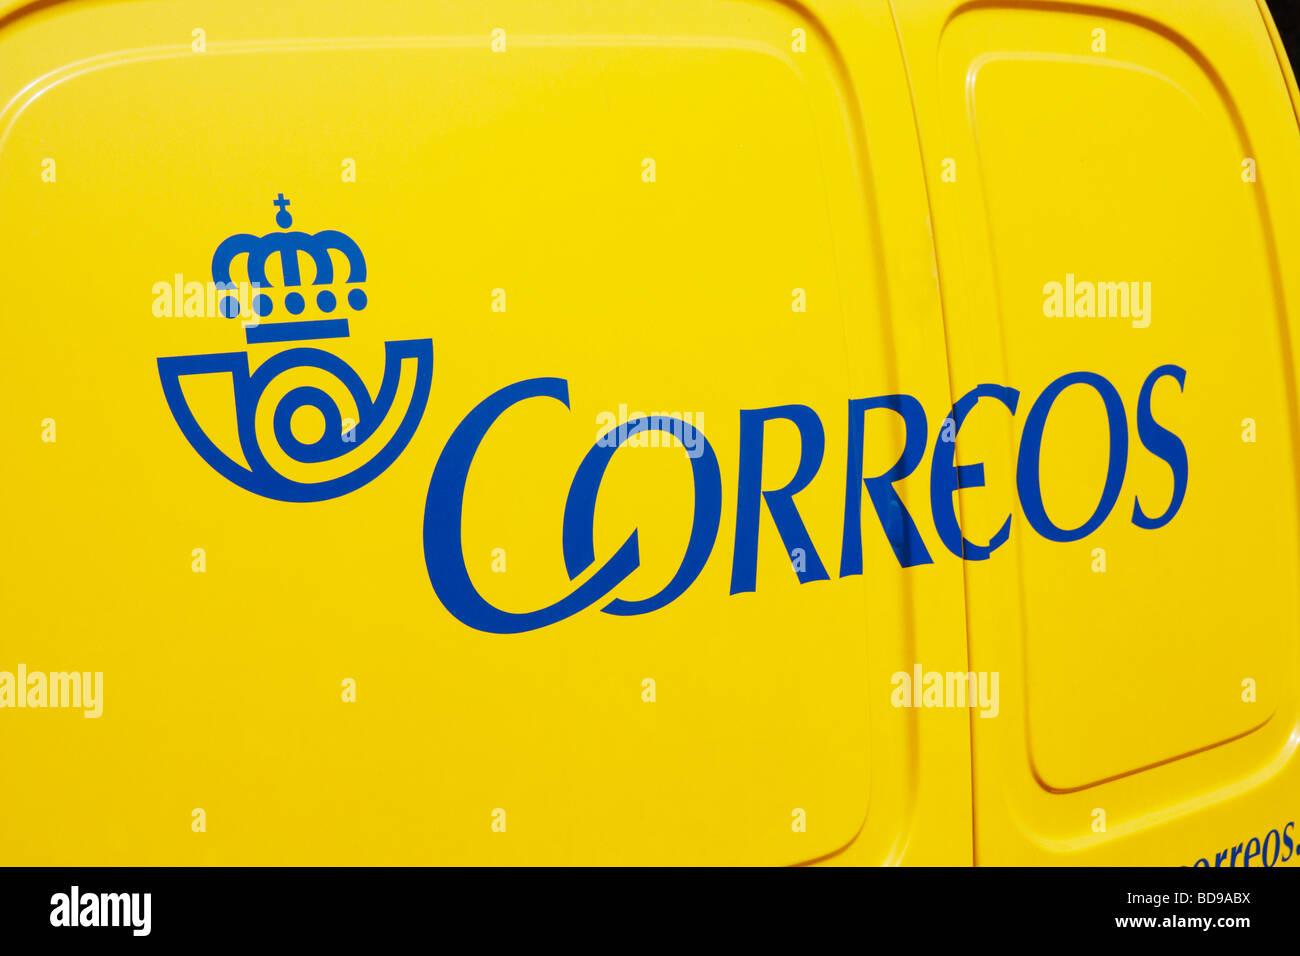 Spanish postal service mail delivery van - Stock Image